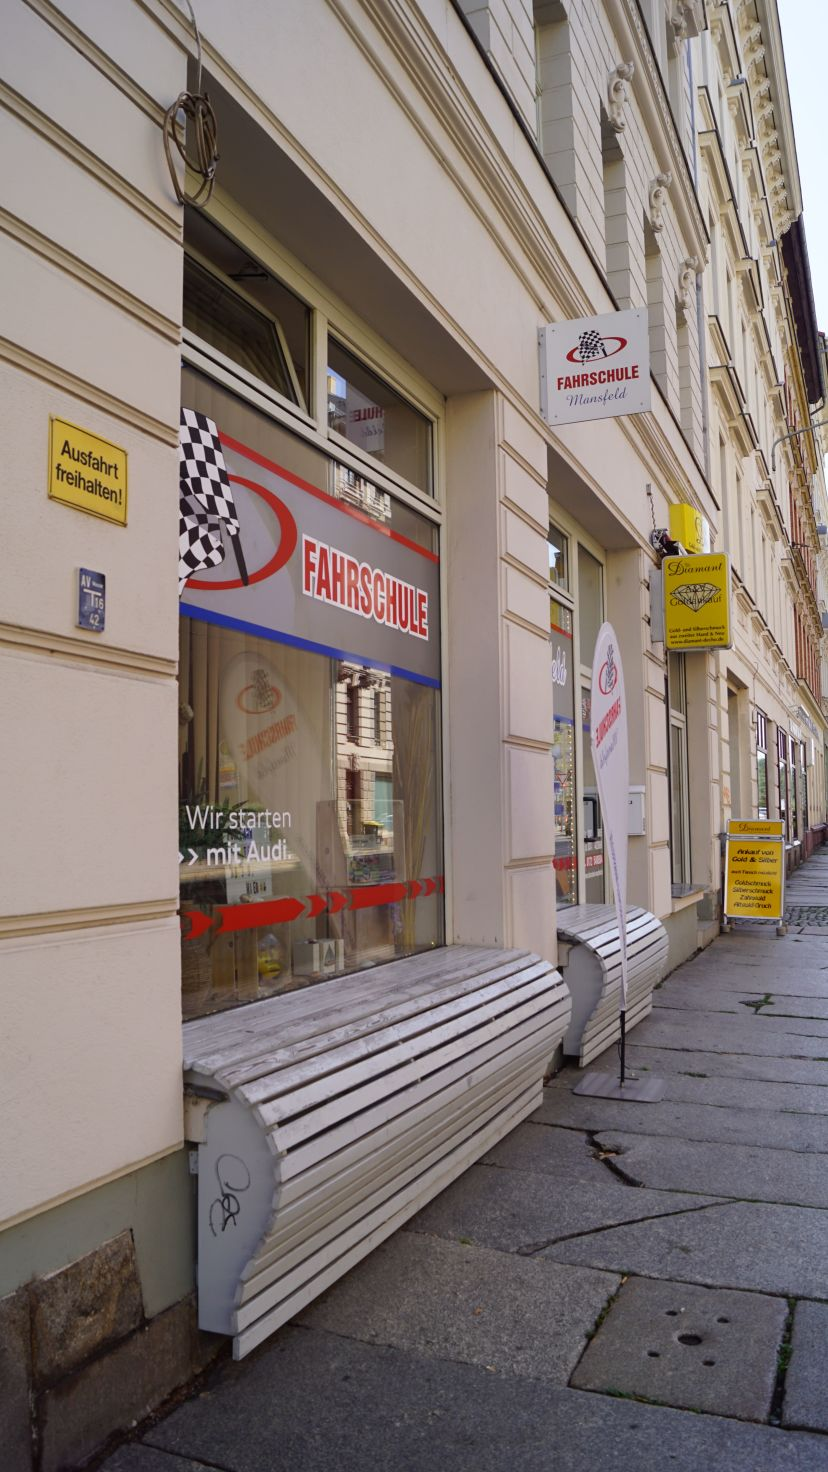 Fahrschule Mansfeld - Arthur-Hoffmann-Str.89 Südvorstadt 4